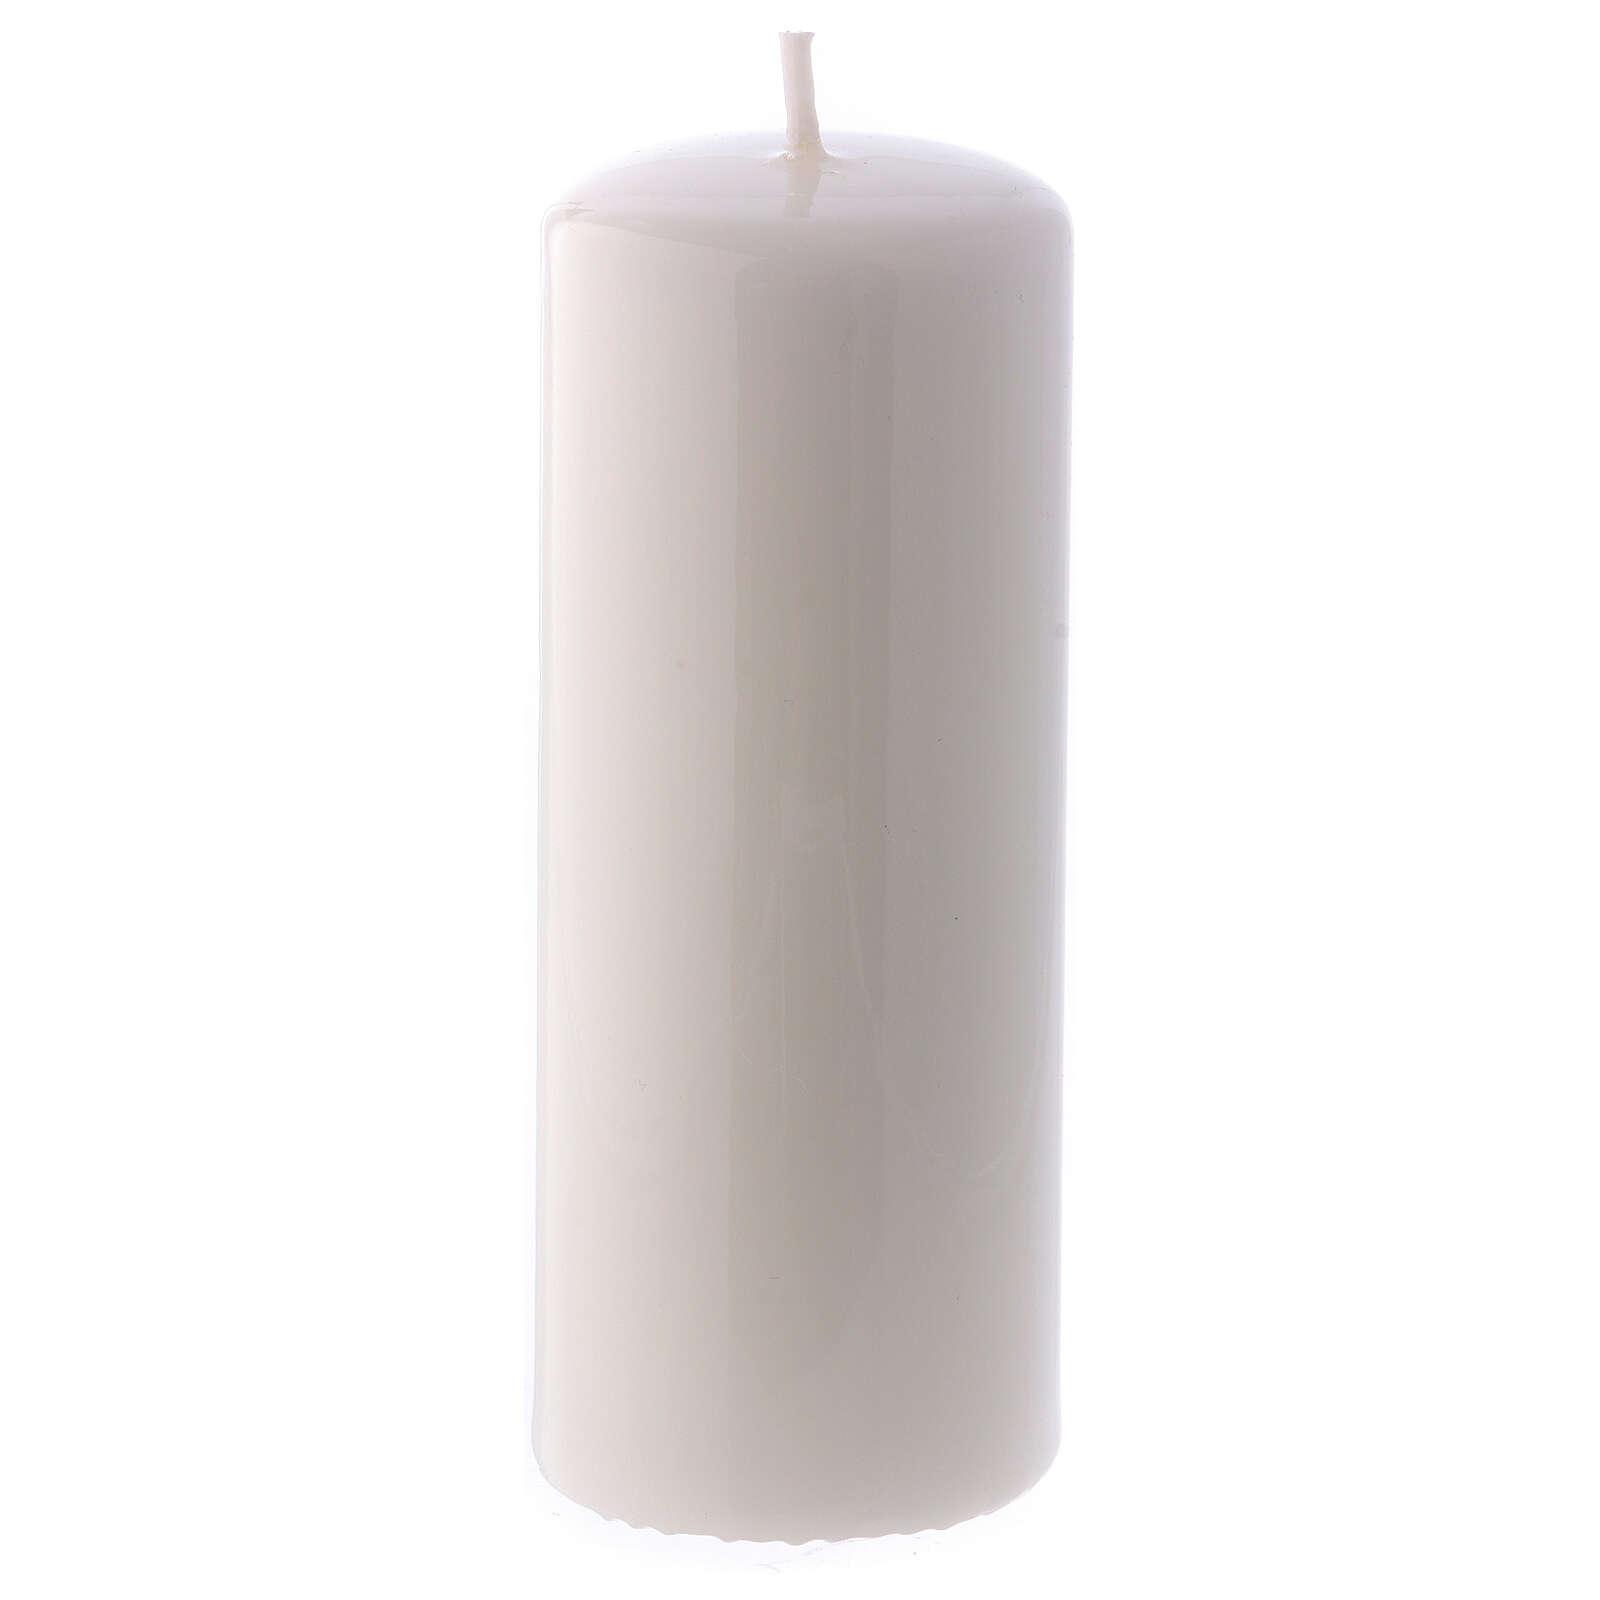 Shiny White Pillar Candle Ceralacca, 5x13 cm 3